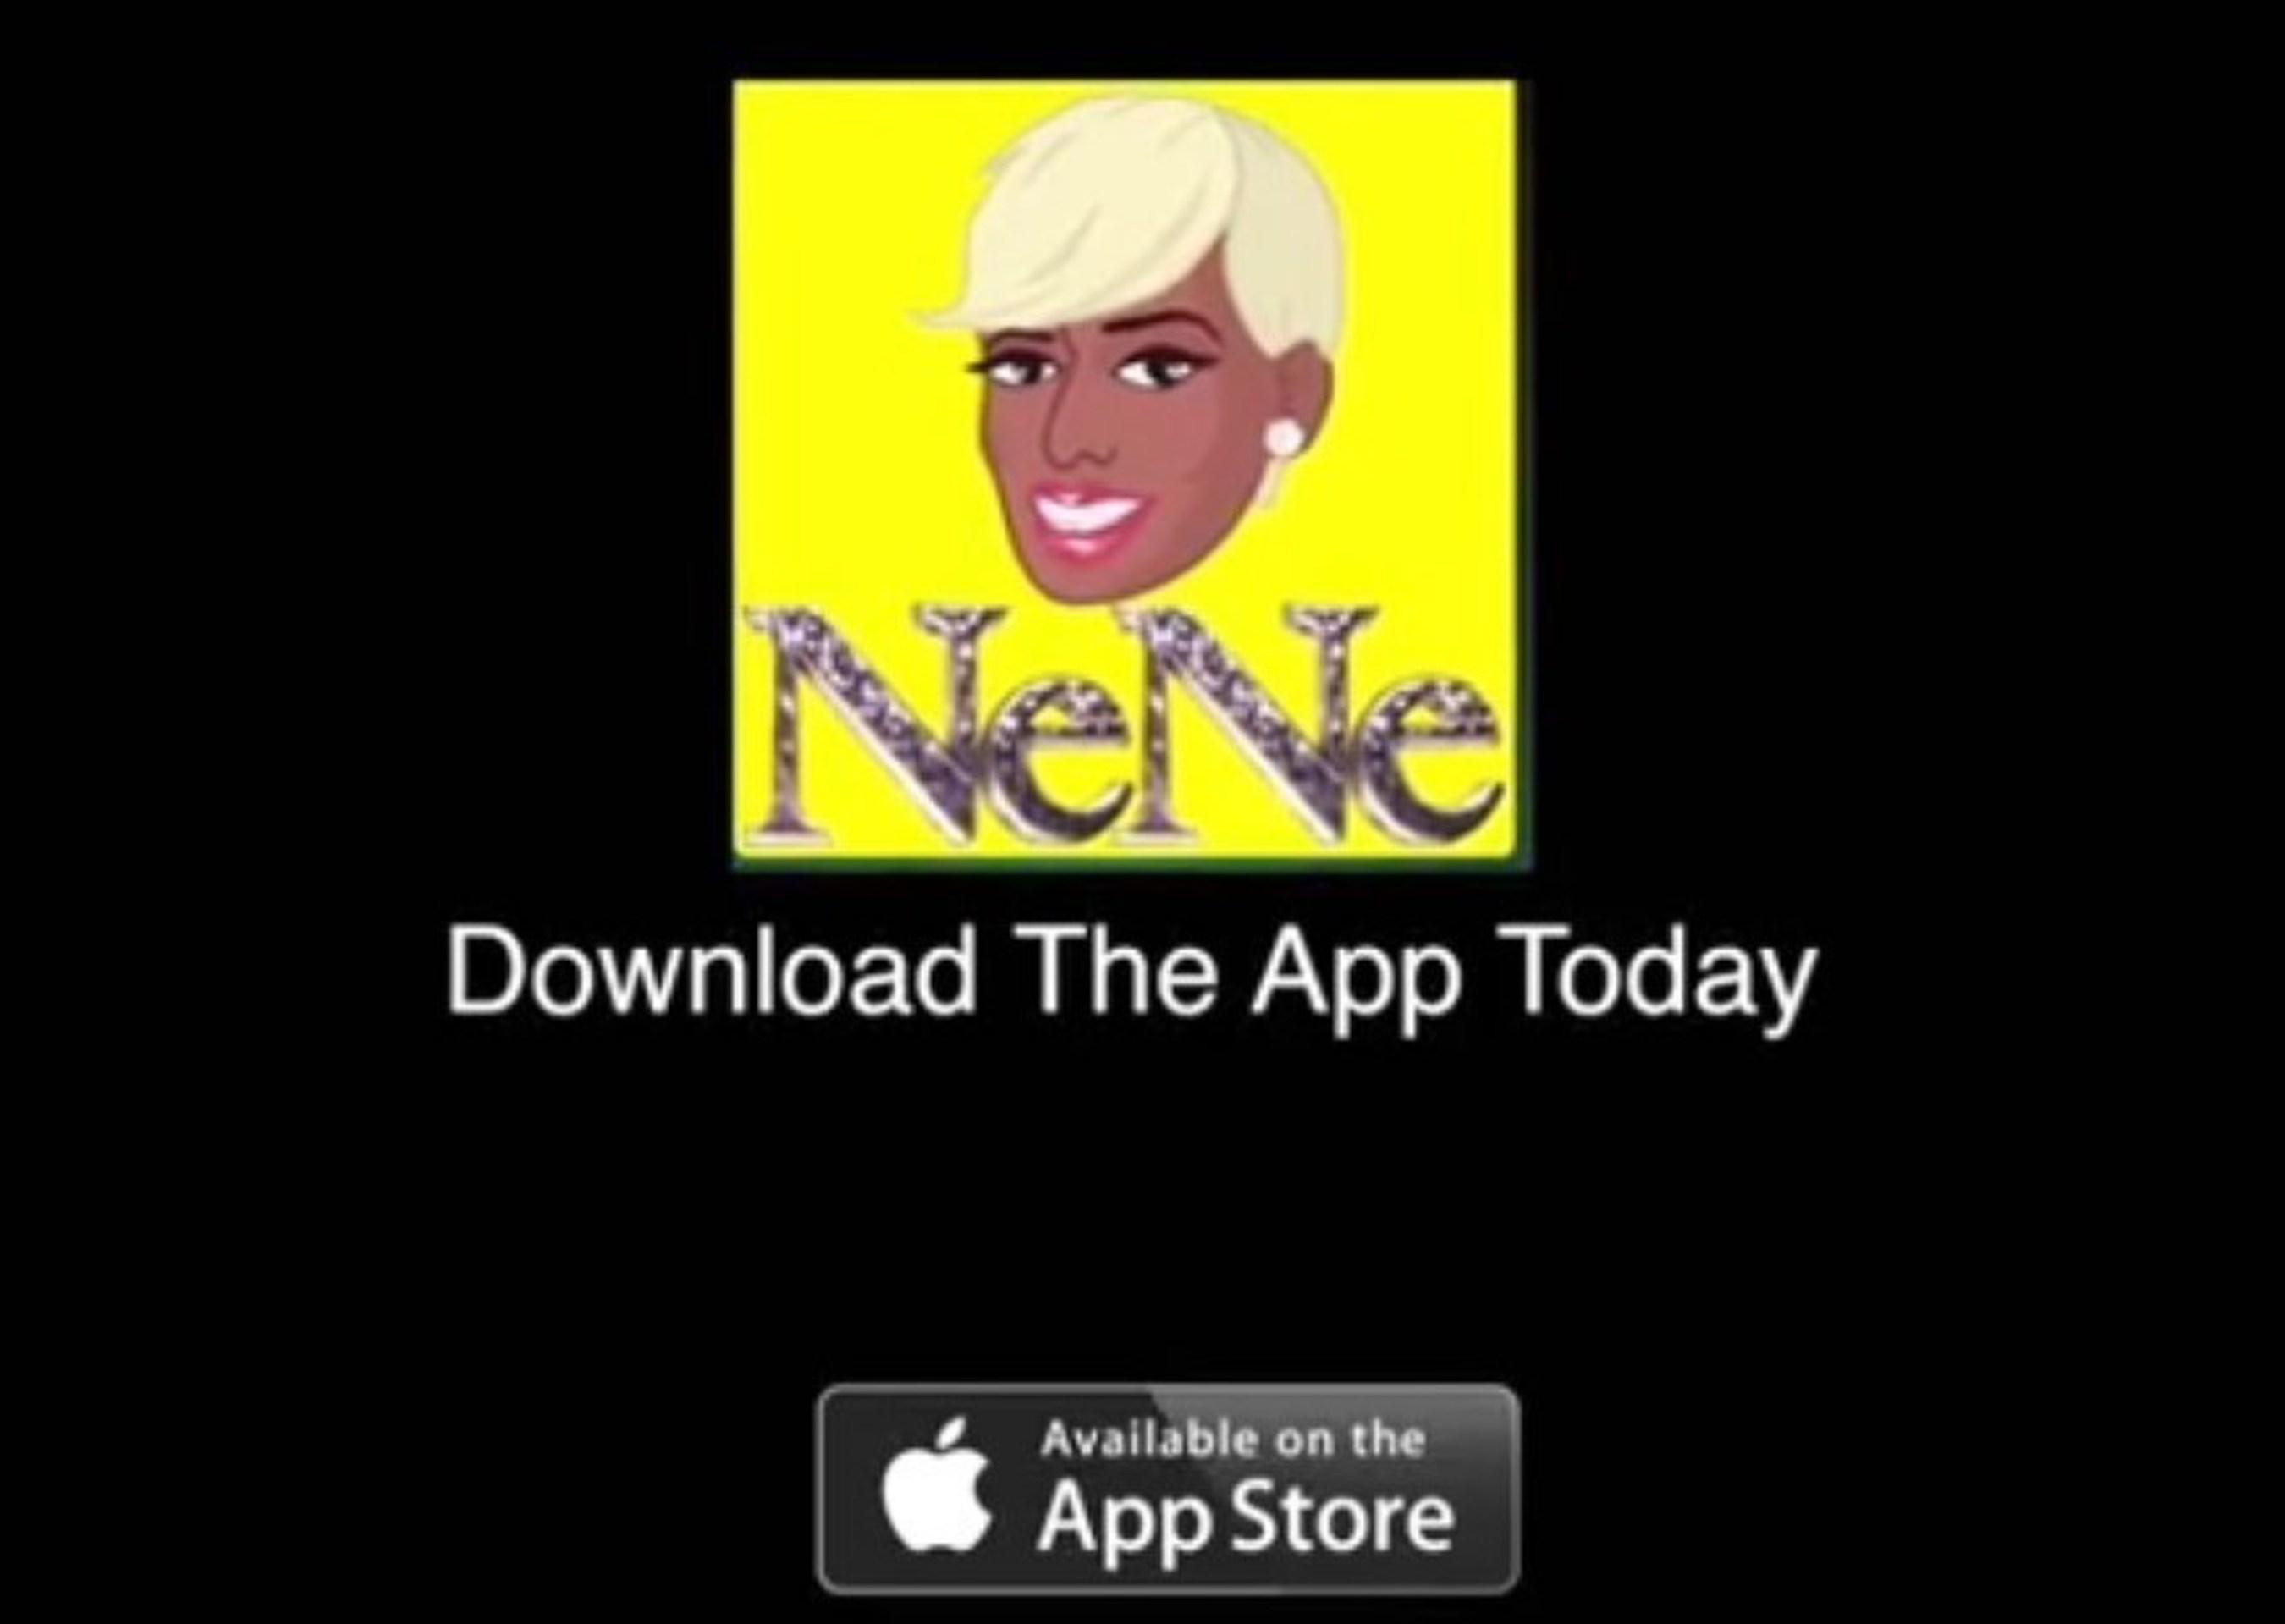 Sapp & Sapp, LLC Proudly Announces the Launch of Nene Leakes New Mobile App